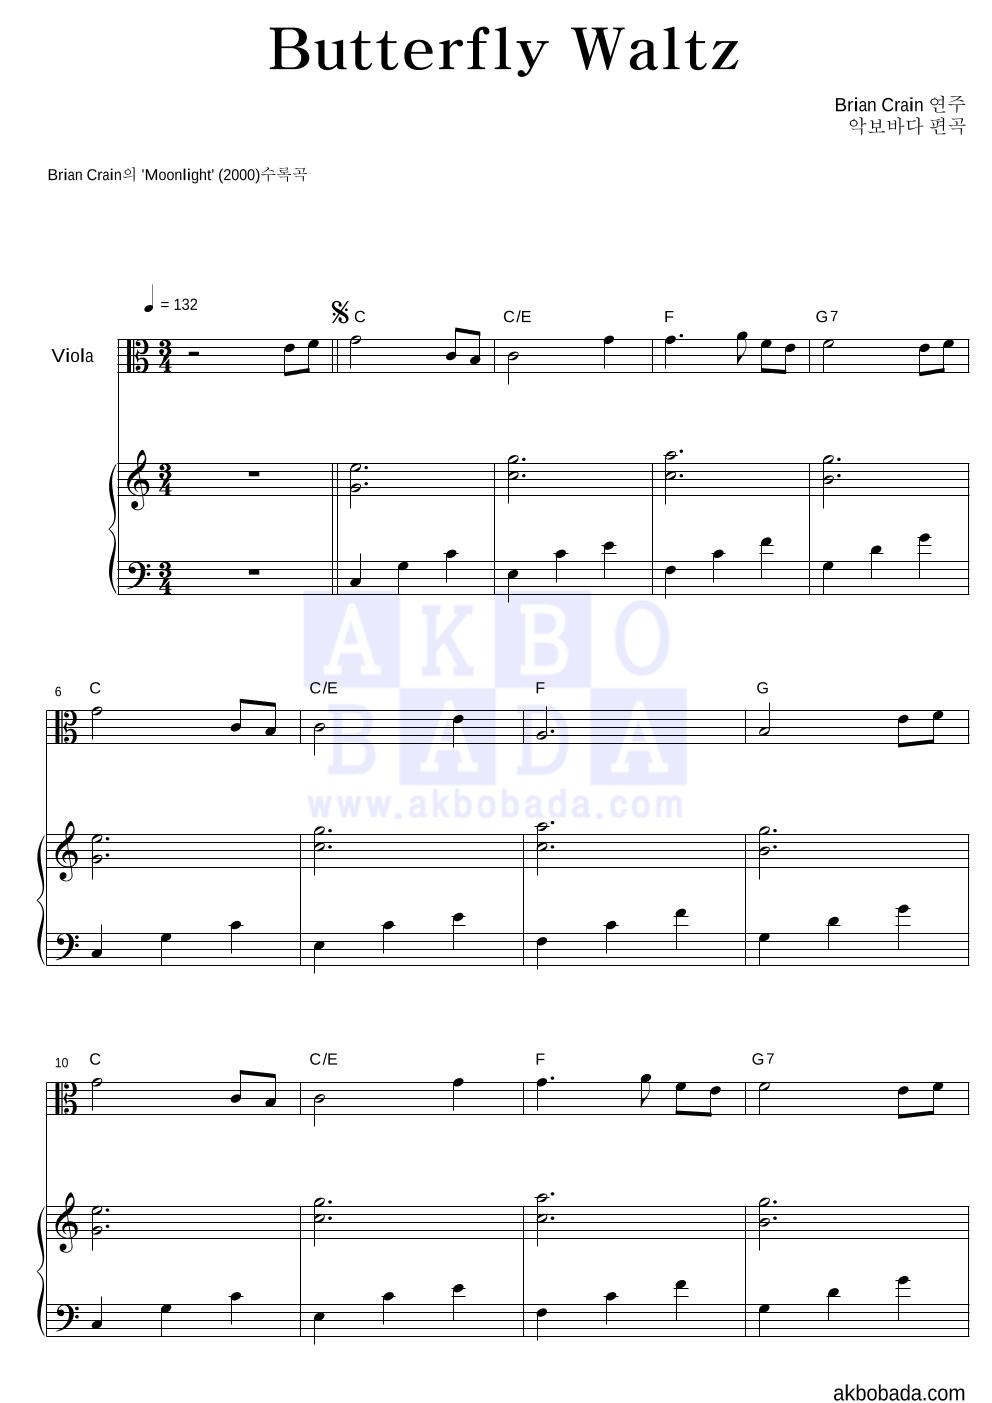 Brian Crain - Butterfly Waltz 비올라&피아노 악보